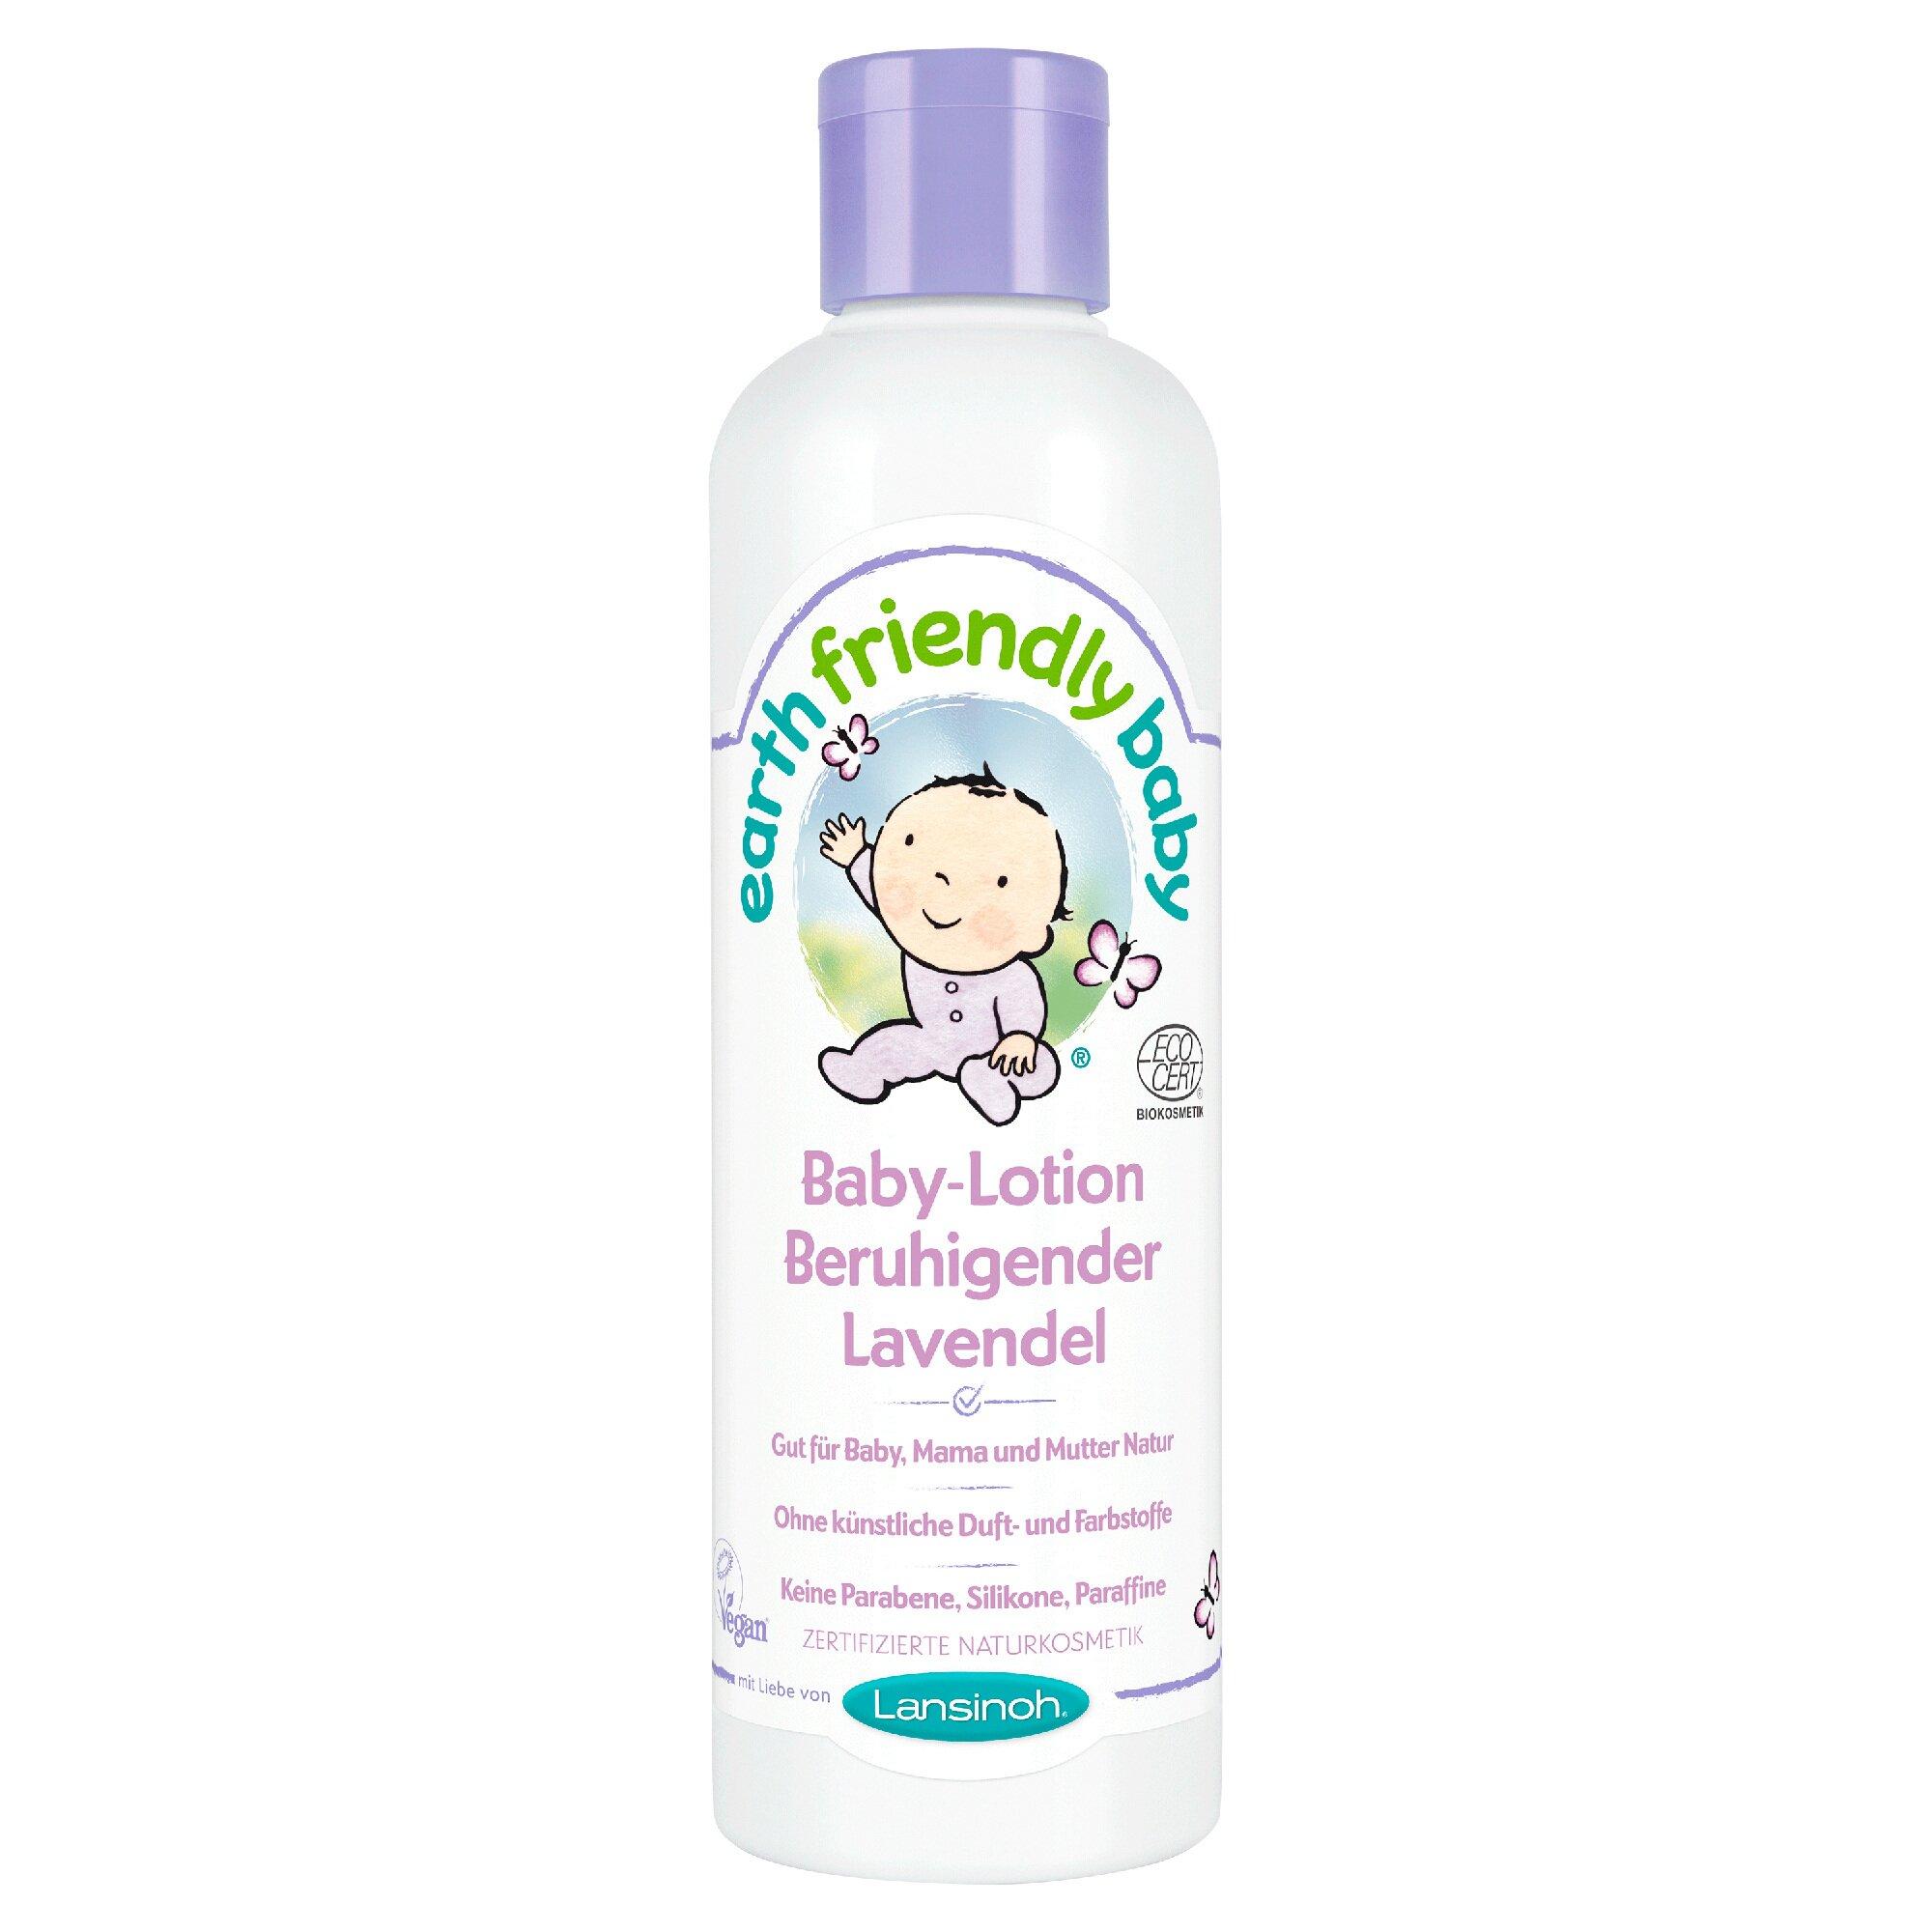 Earth Friendly Baby Körperlotion Beruhigender Lavendel 250 ml